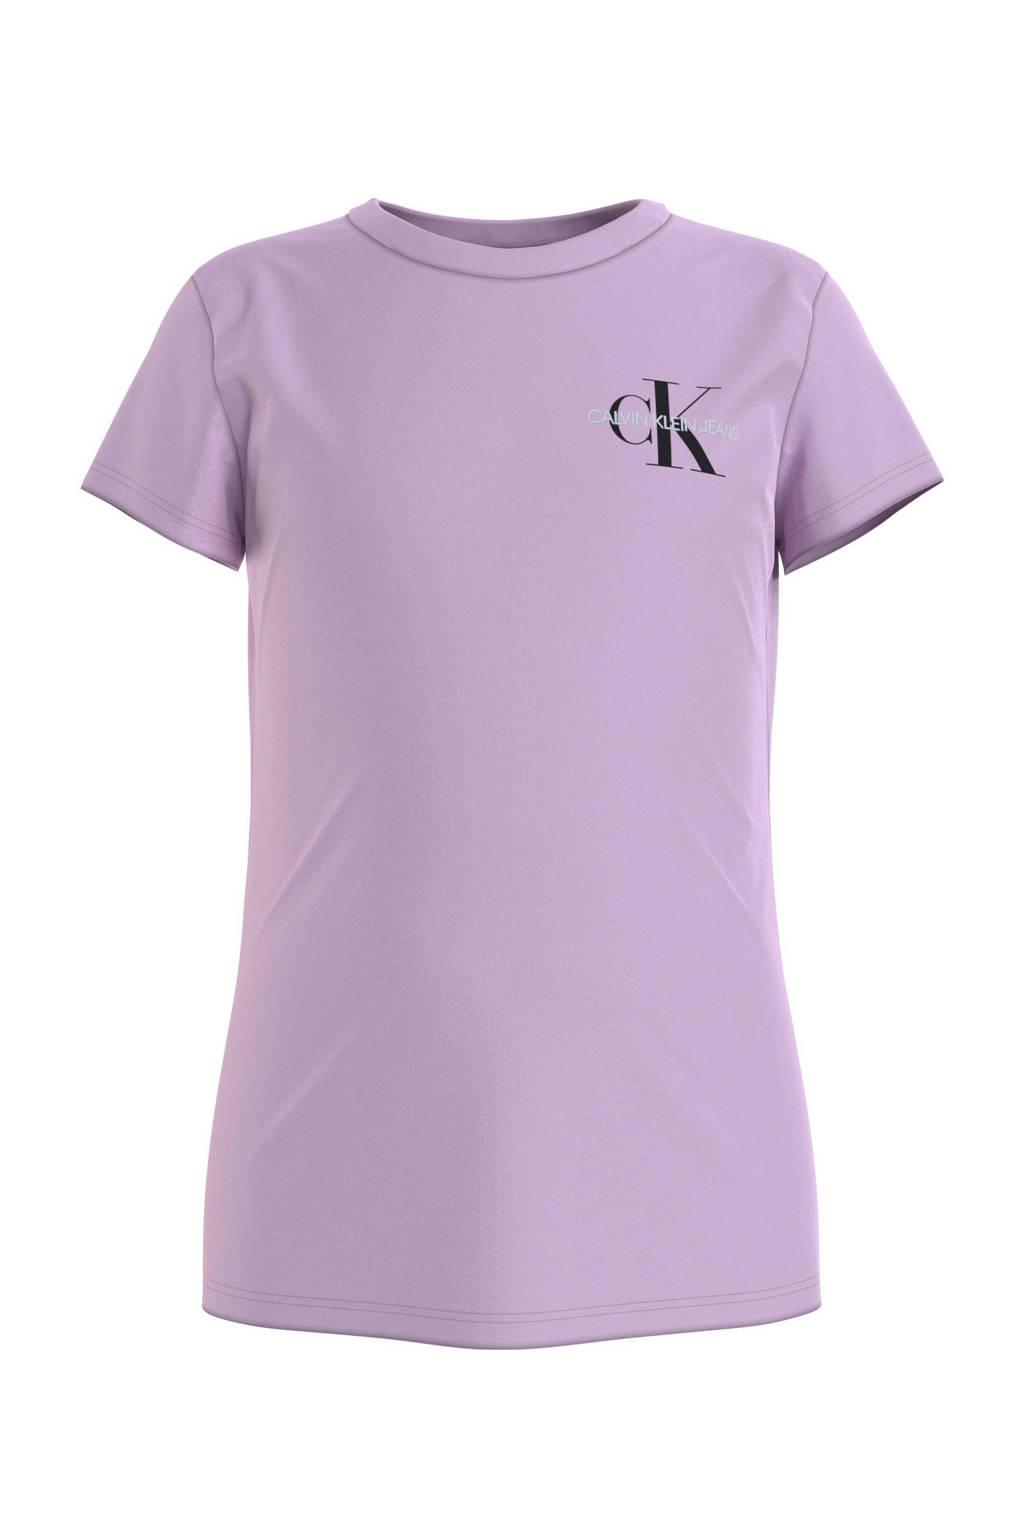 CALVIN KLEIN JEANS T-shirt van biologisch katoen lila, Lila